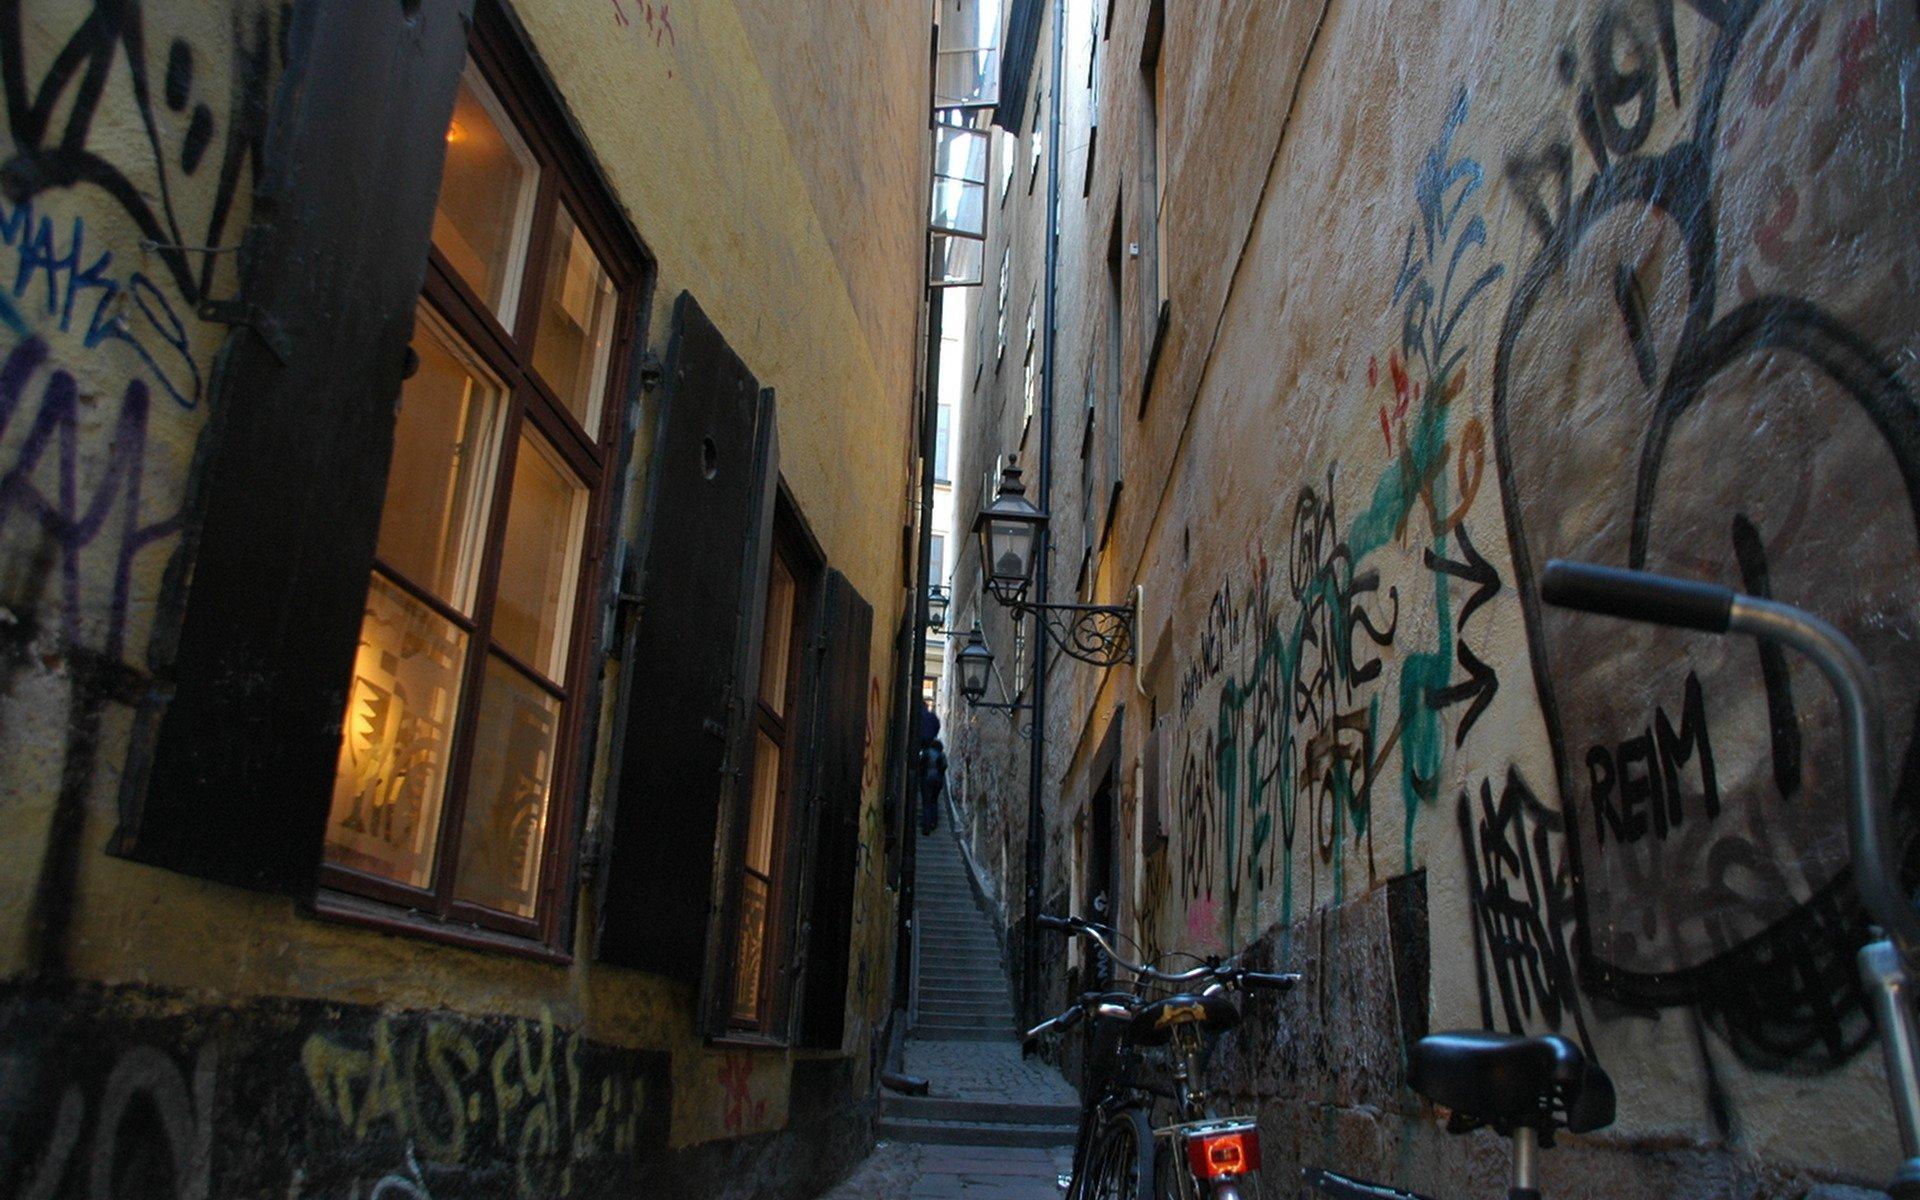 Hd wallpaper city - Hd Wallpaper Background Id 84634